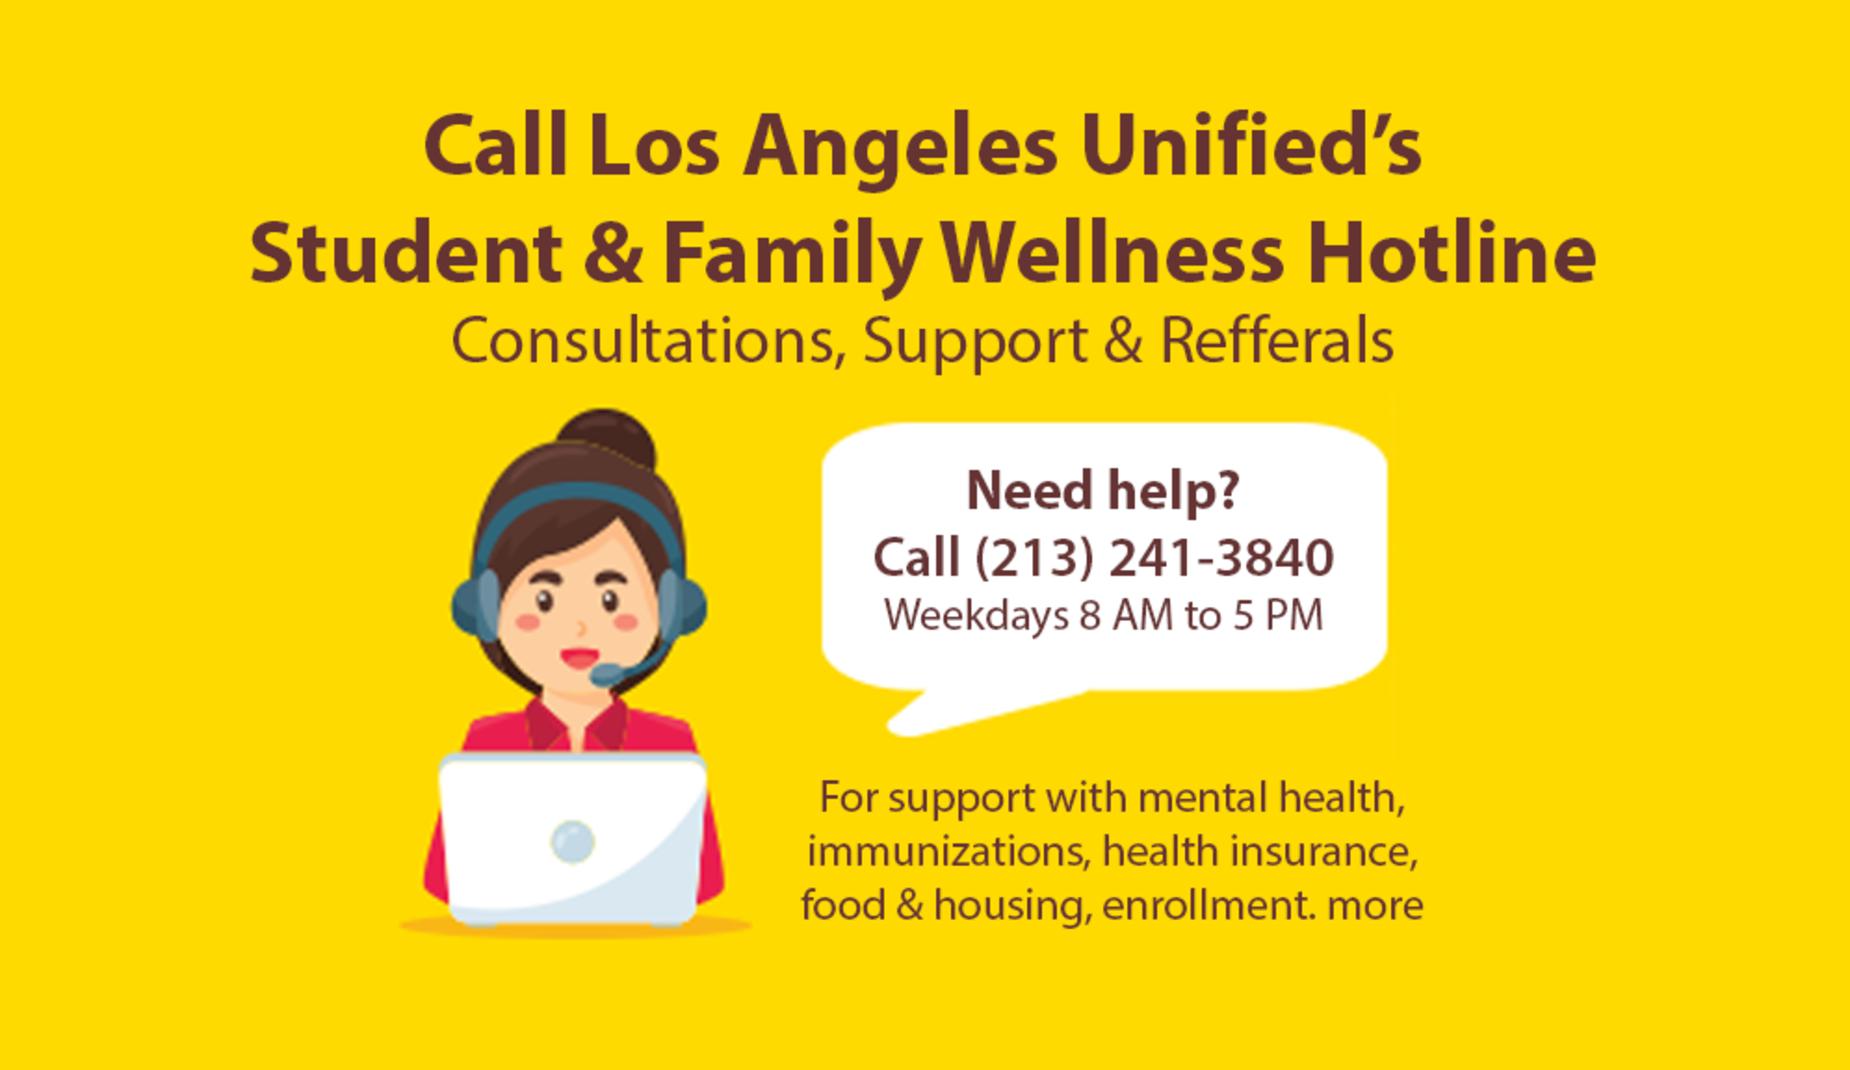 LA Unified Student & Family Wellness Hotline